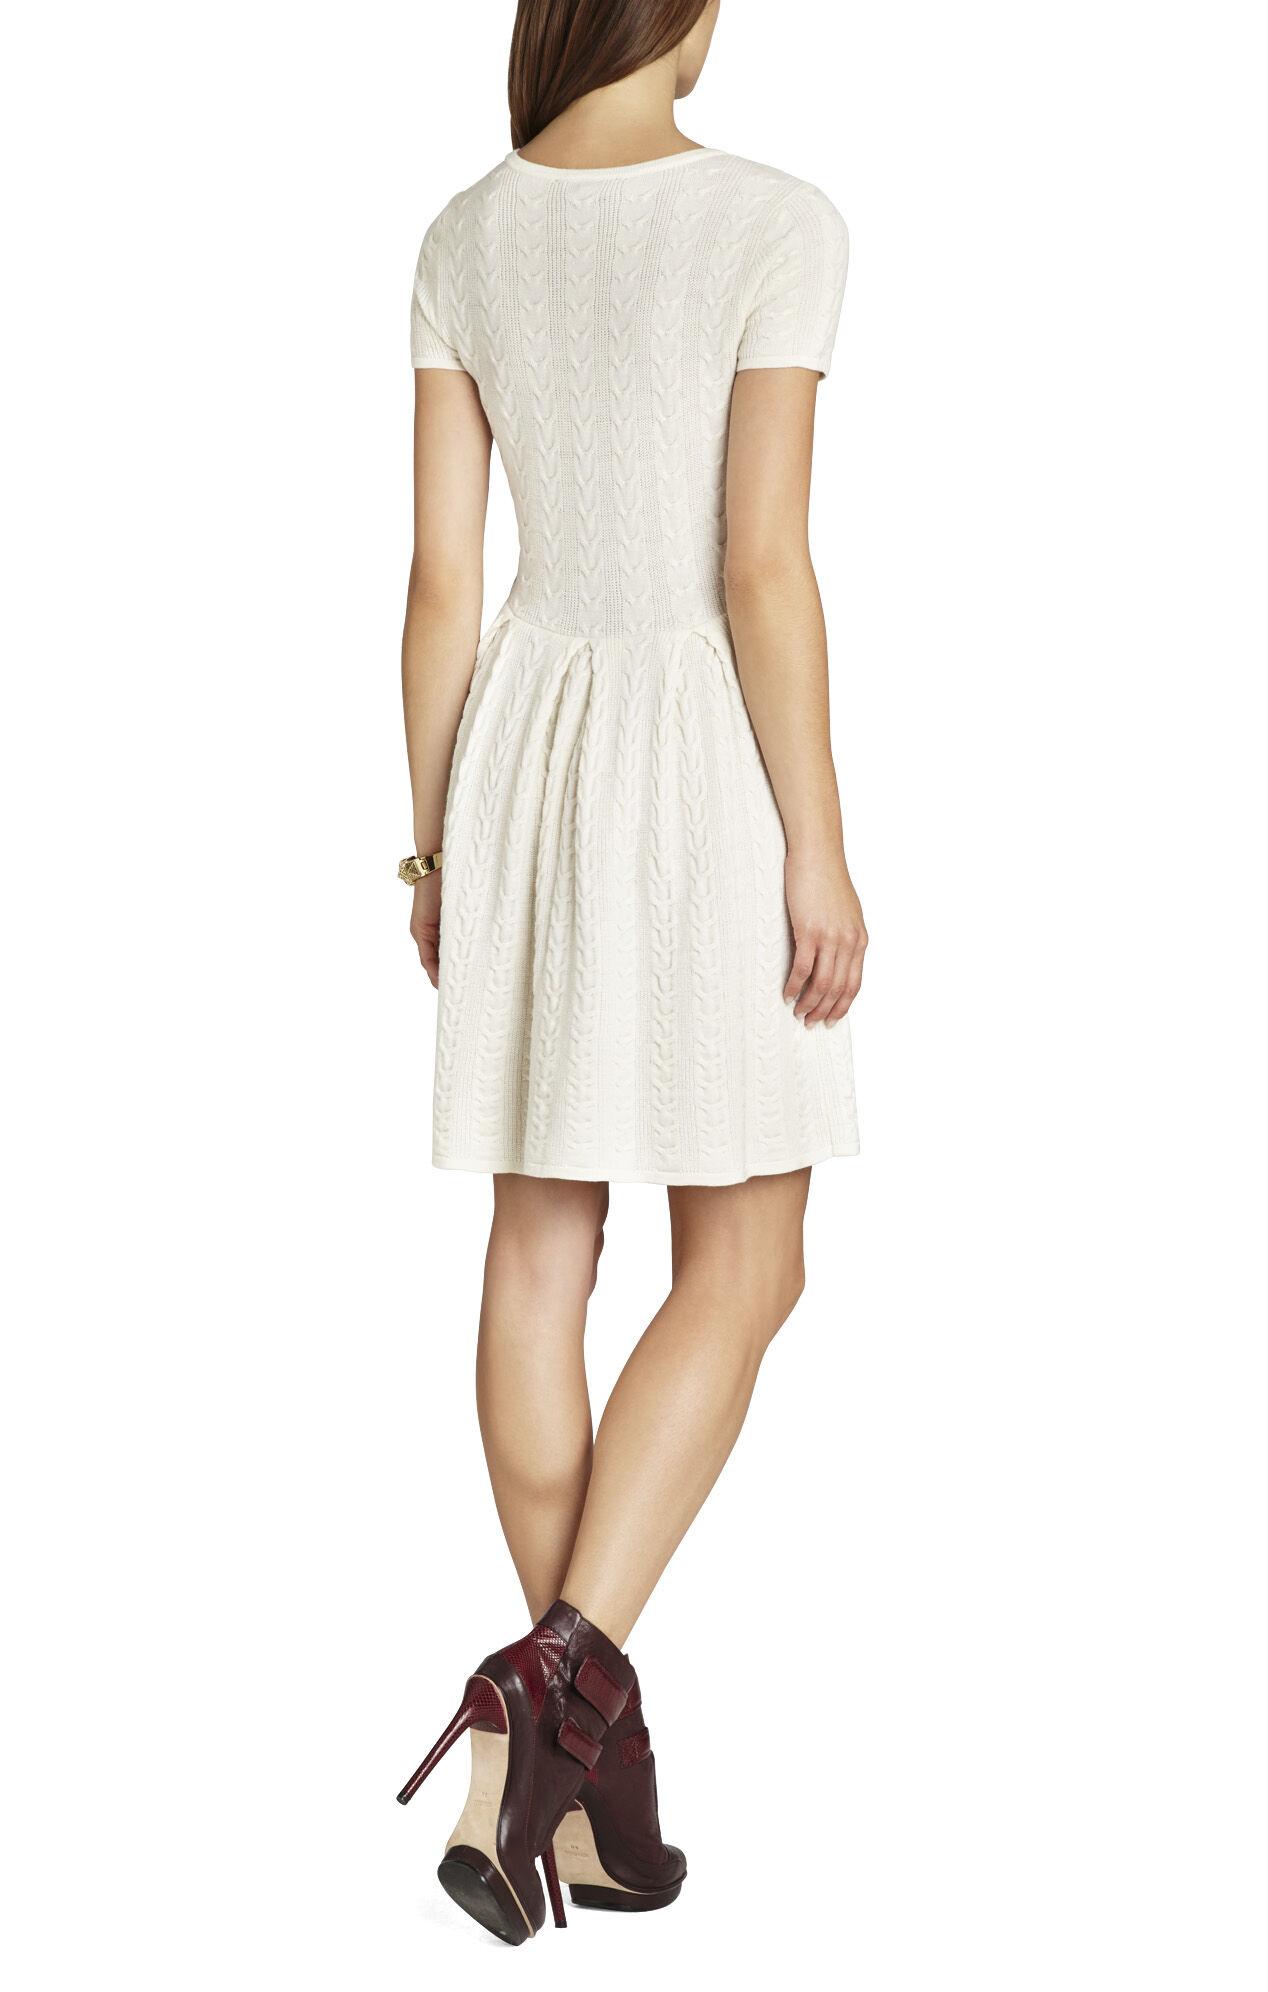 Cydney Cable A-Line Dress